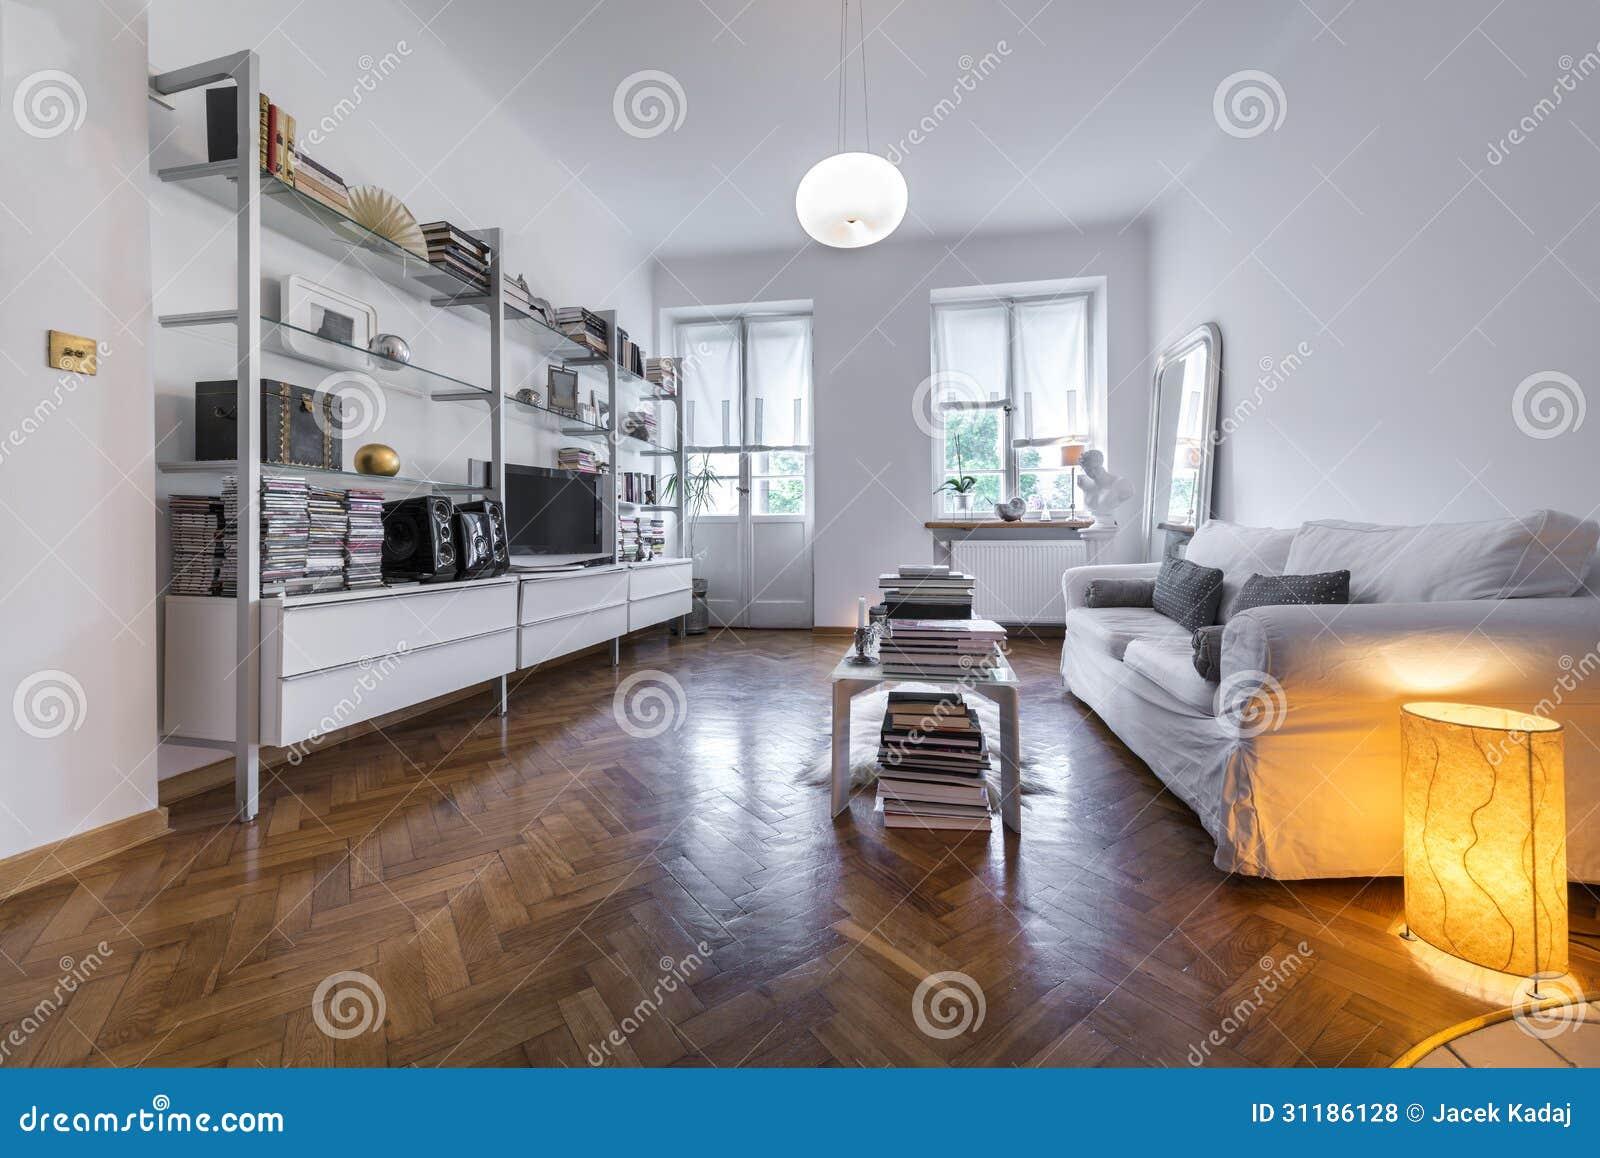 Post Modern Interior Design Interior Royalty Free Stock